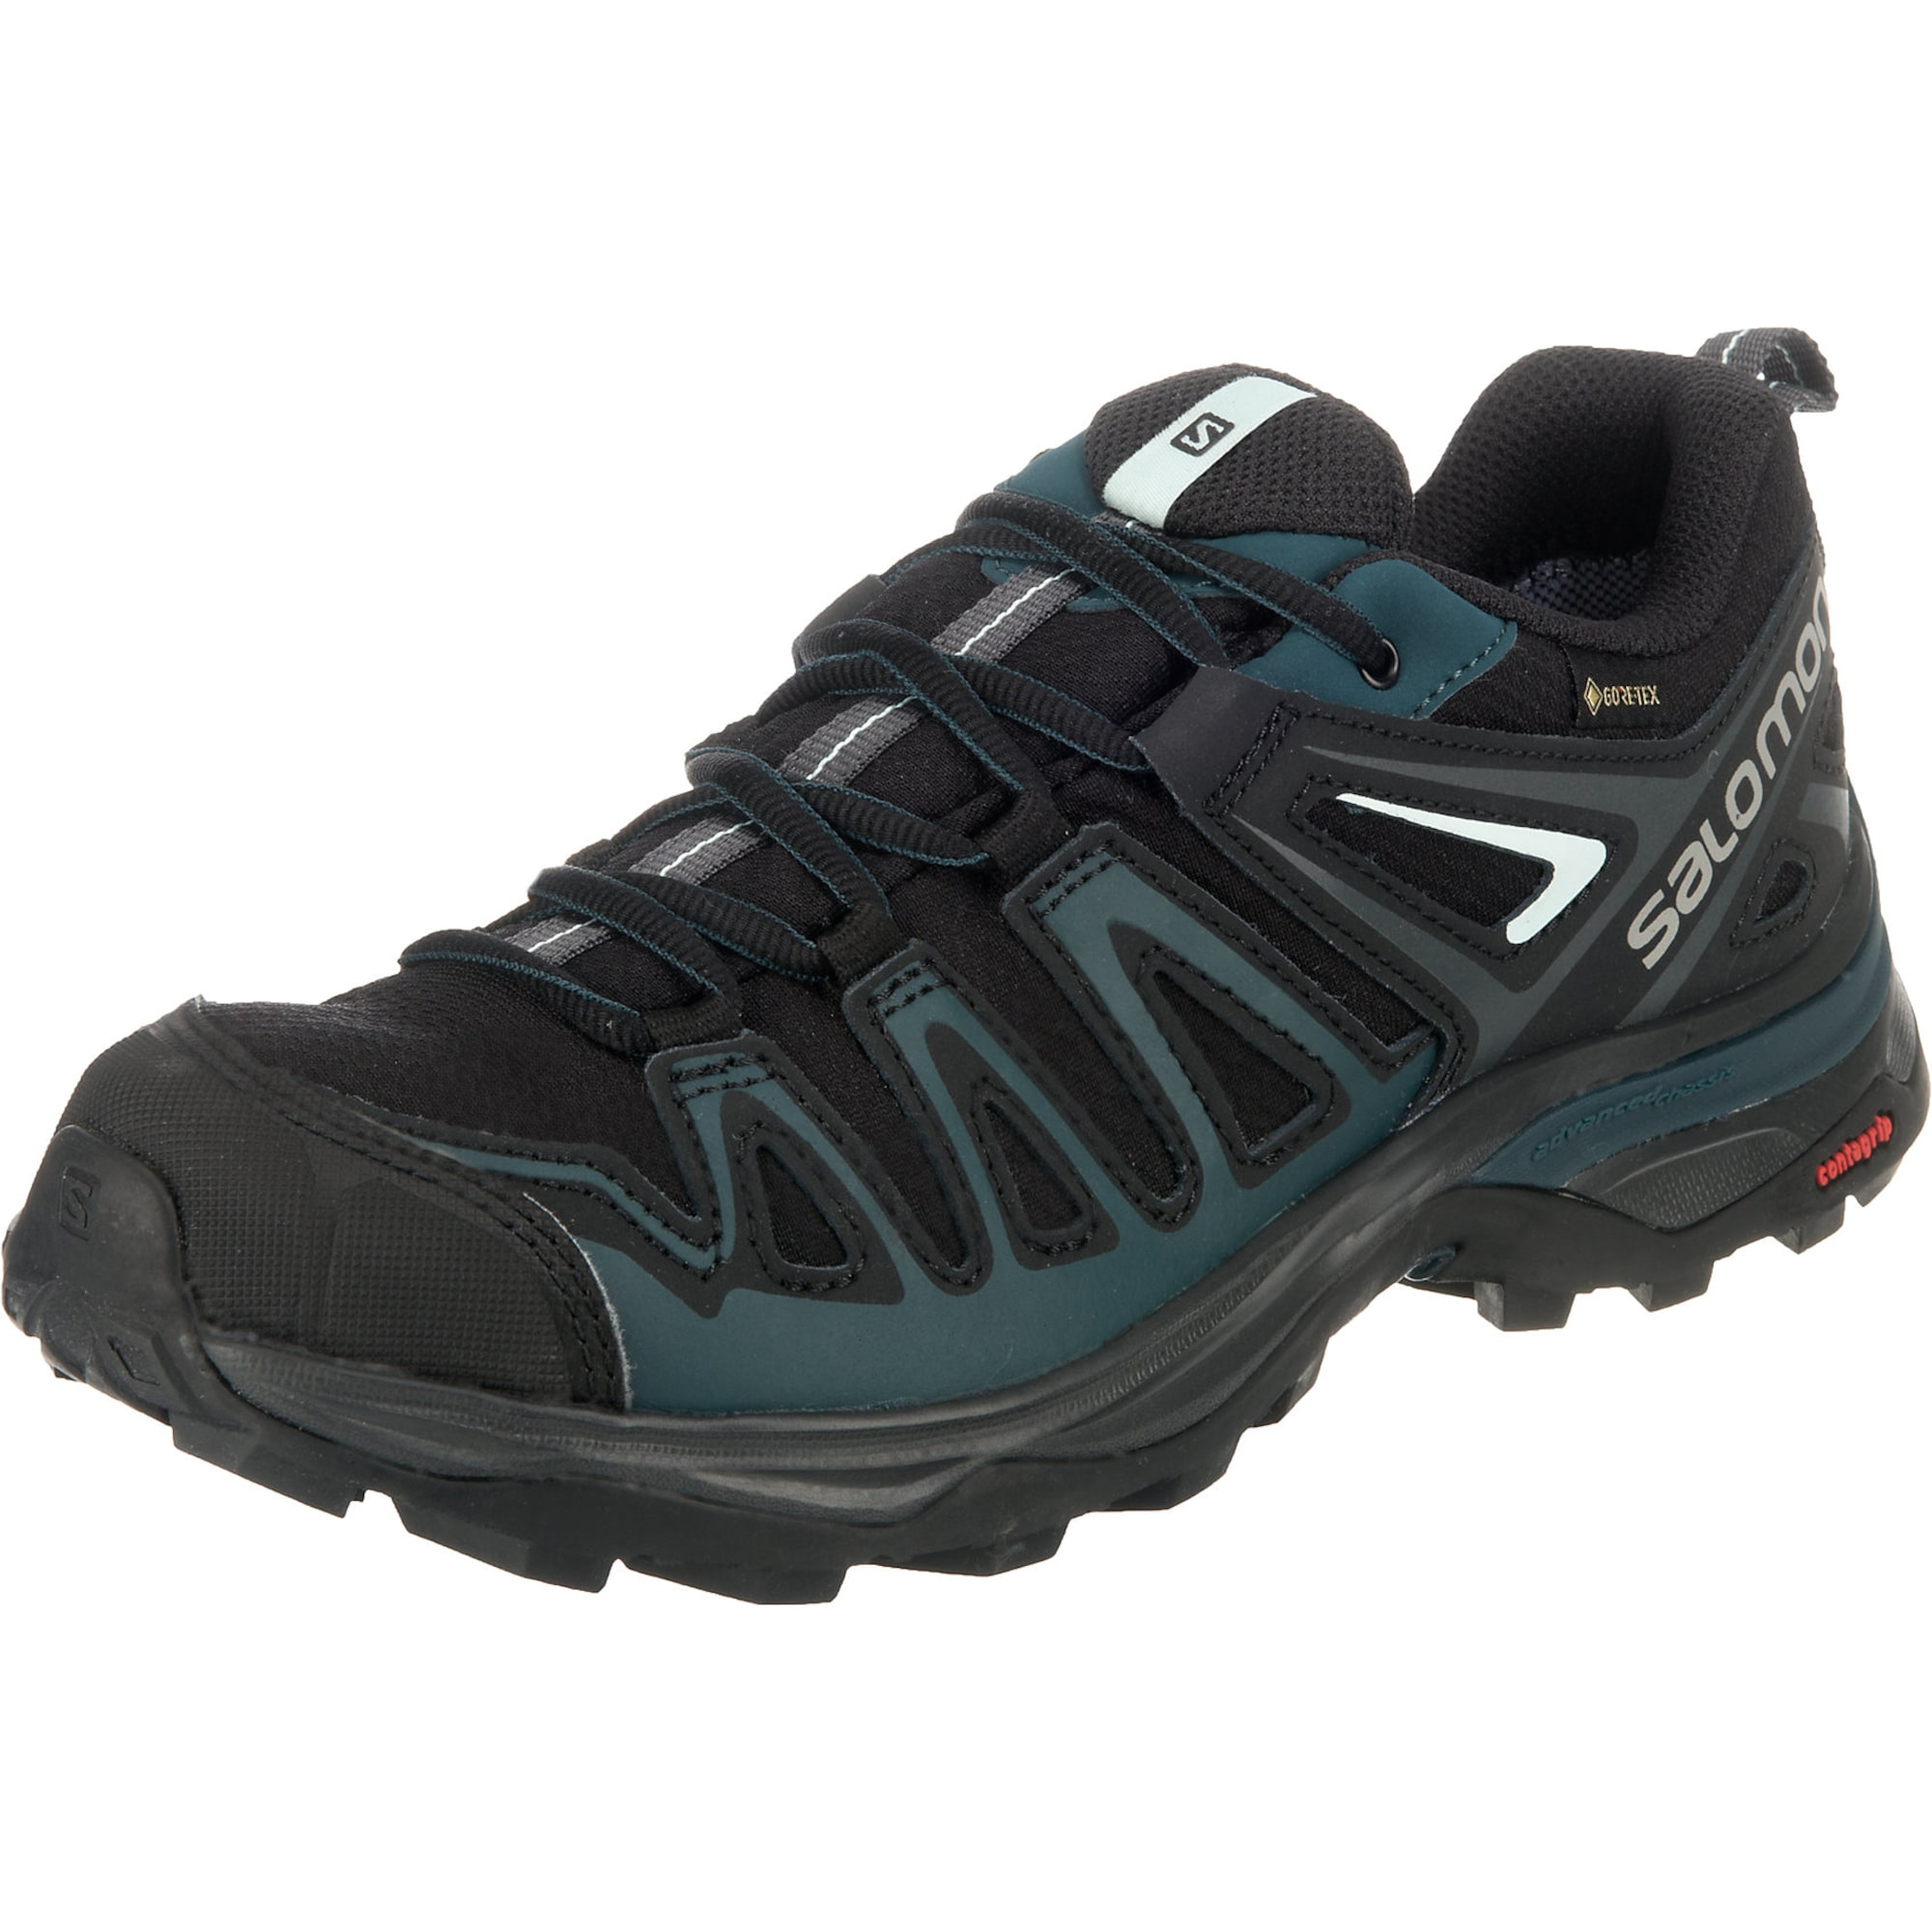 Trekkingschuhe 'X Ultra 3 Prime' | Schuhe > Outdoorschuhe > Trekkingschuhe | Salomon